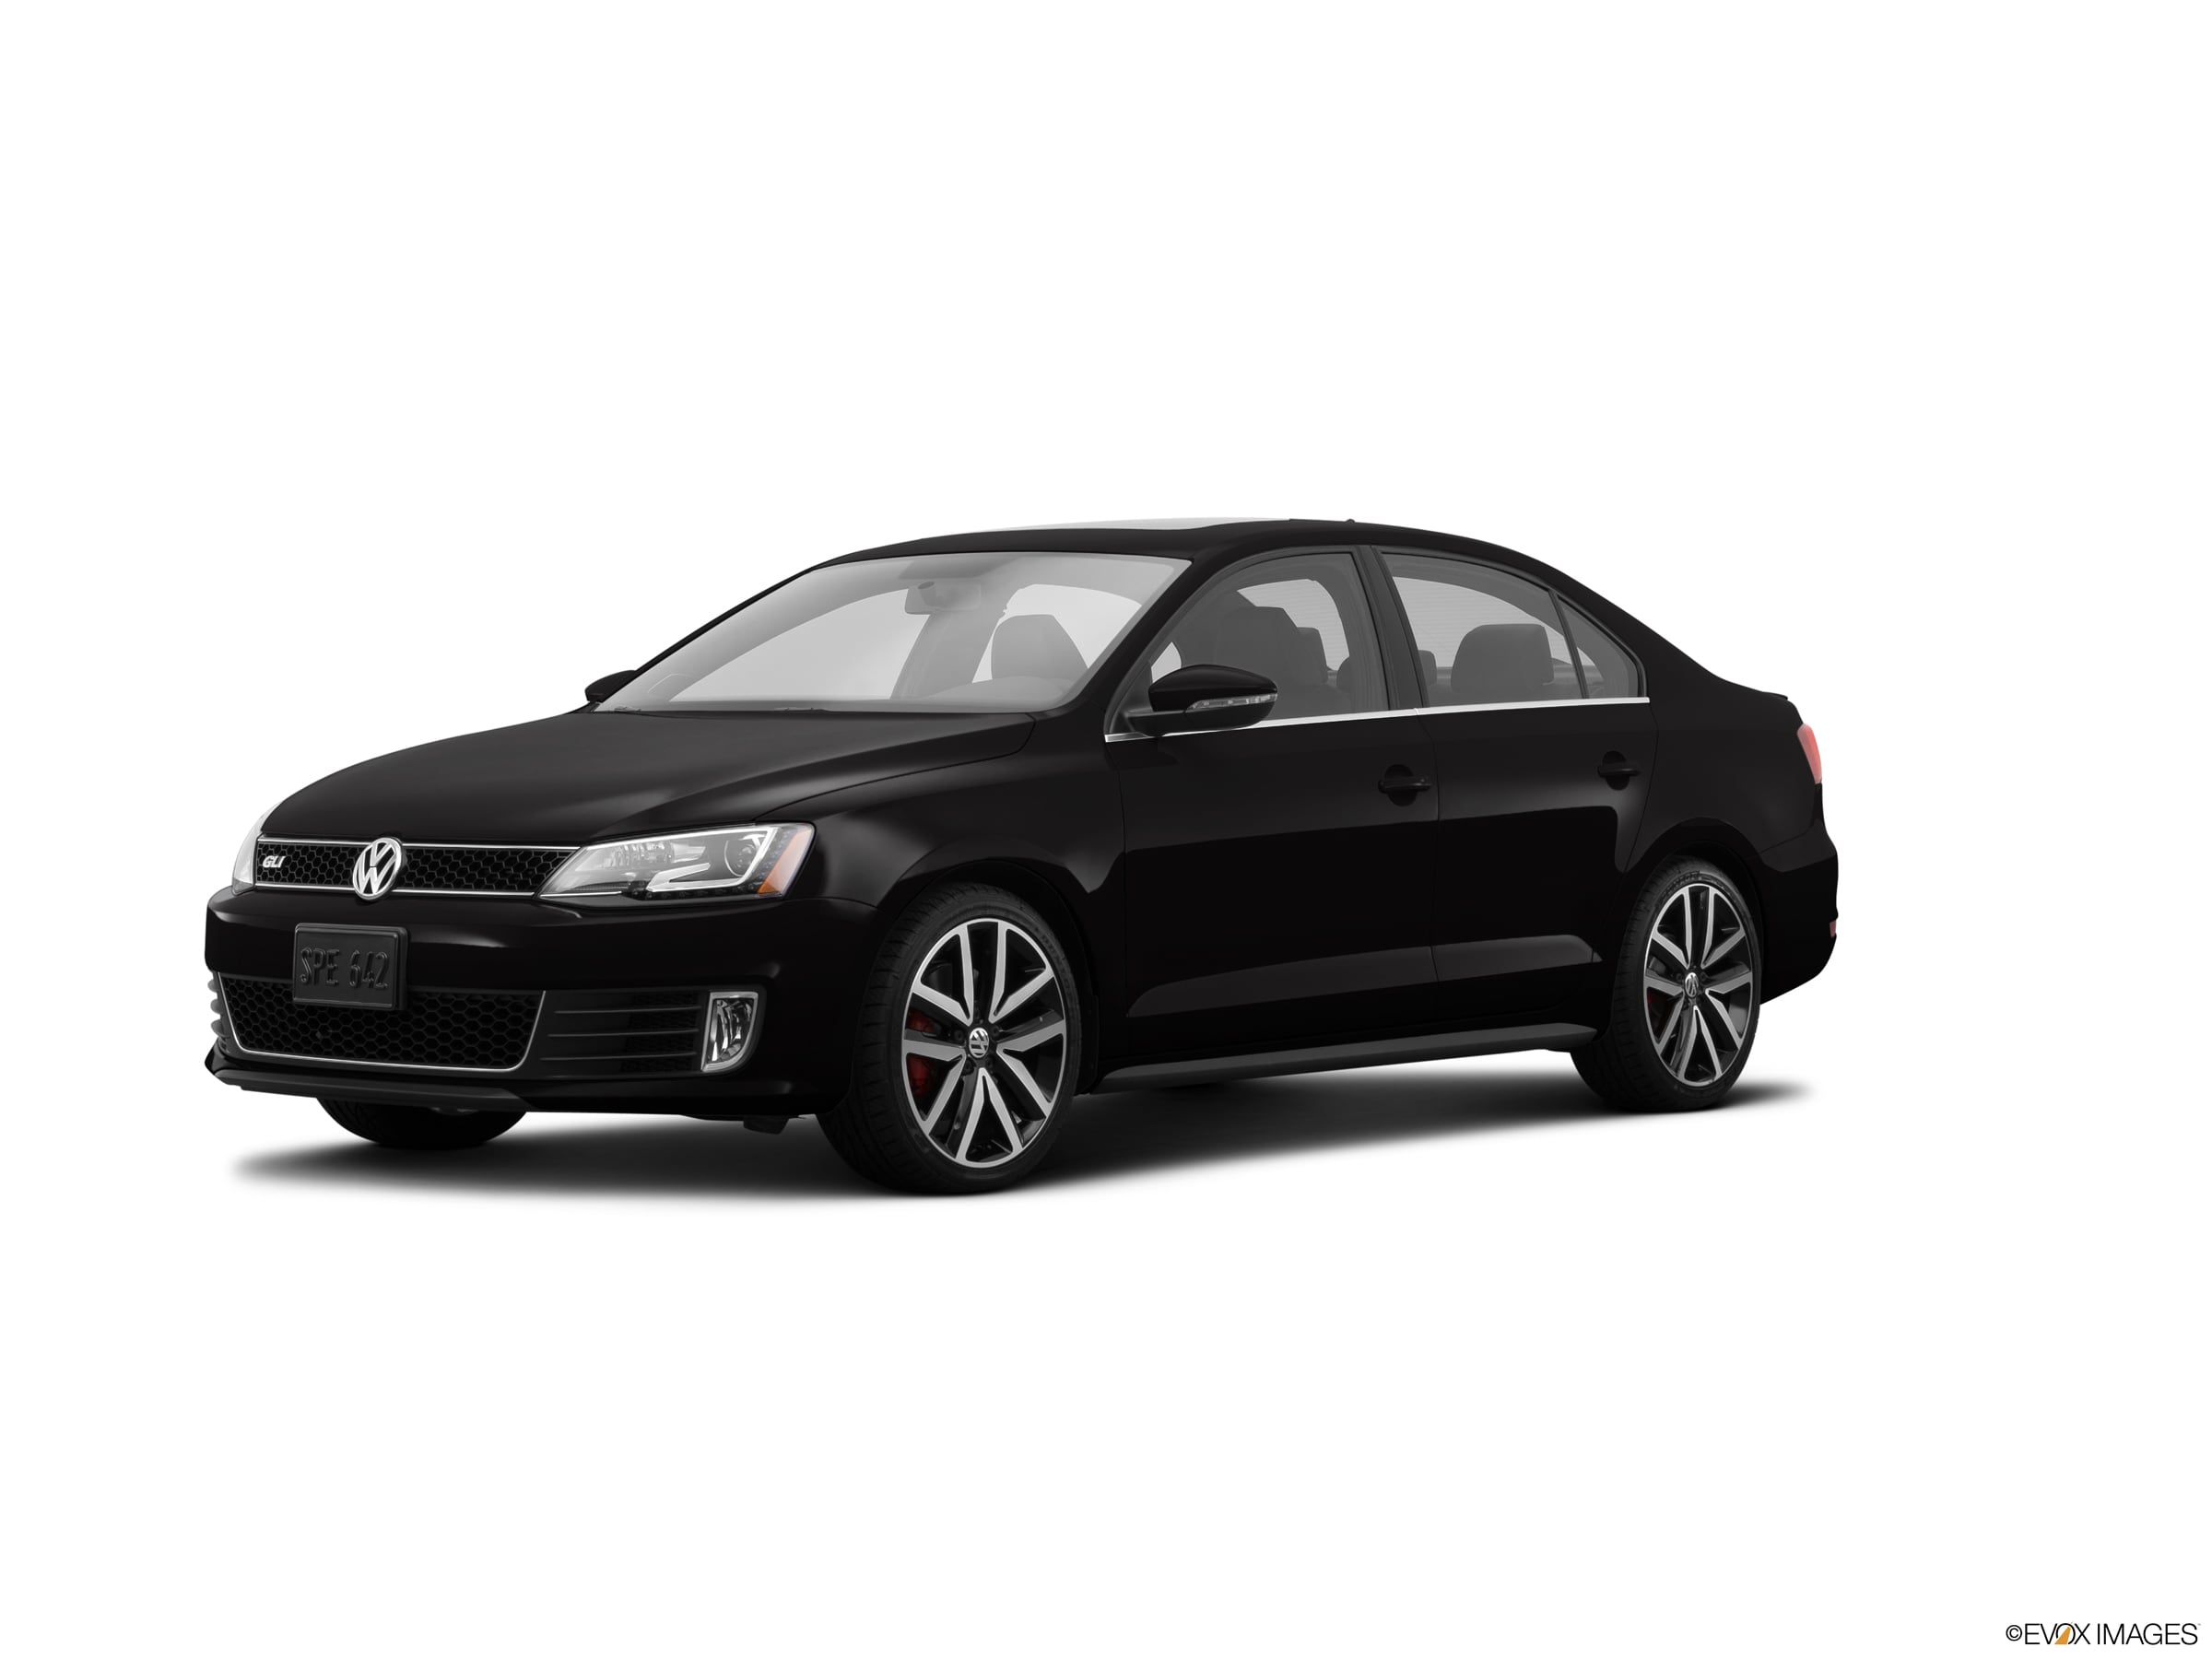 Pre Owned 2014 Volkswagen Jetta Gli Autobahn W Nav For Sale Los Angeles Ca Vin 3vw5t7aj2em207181